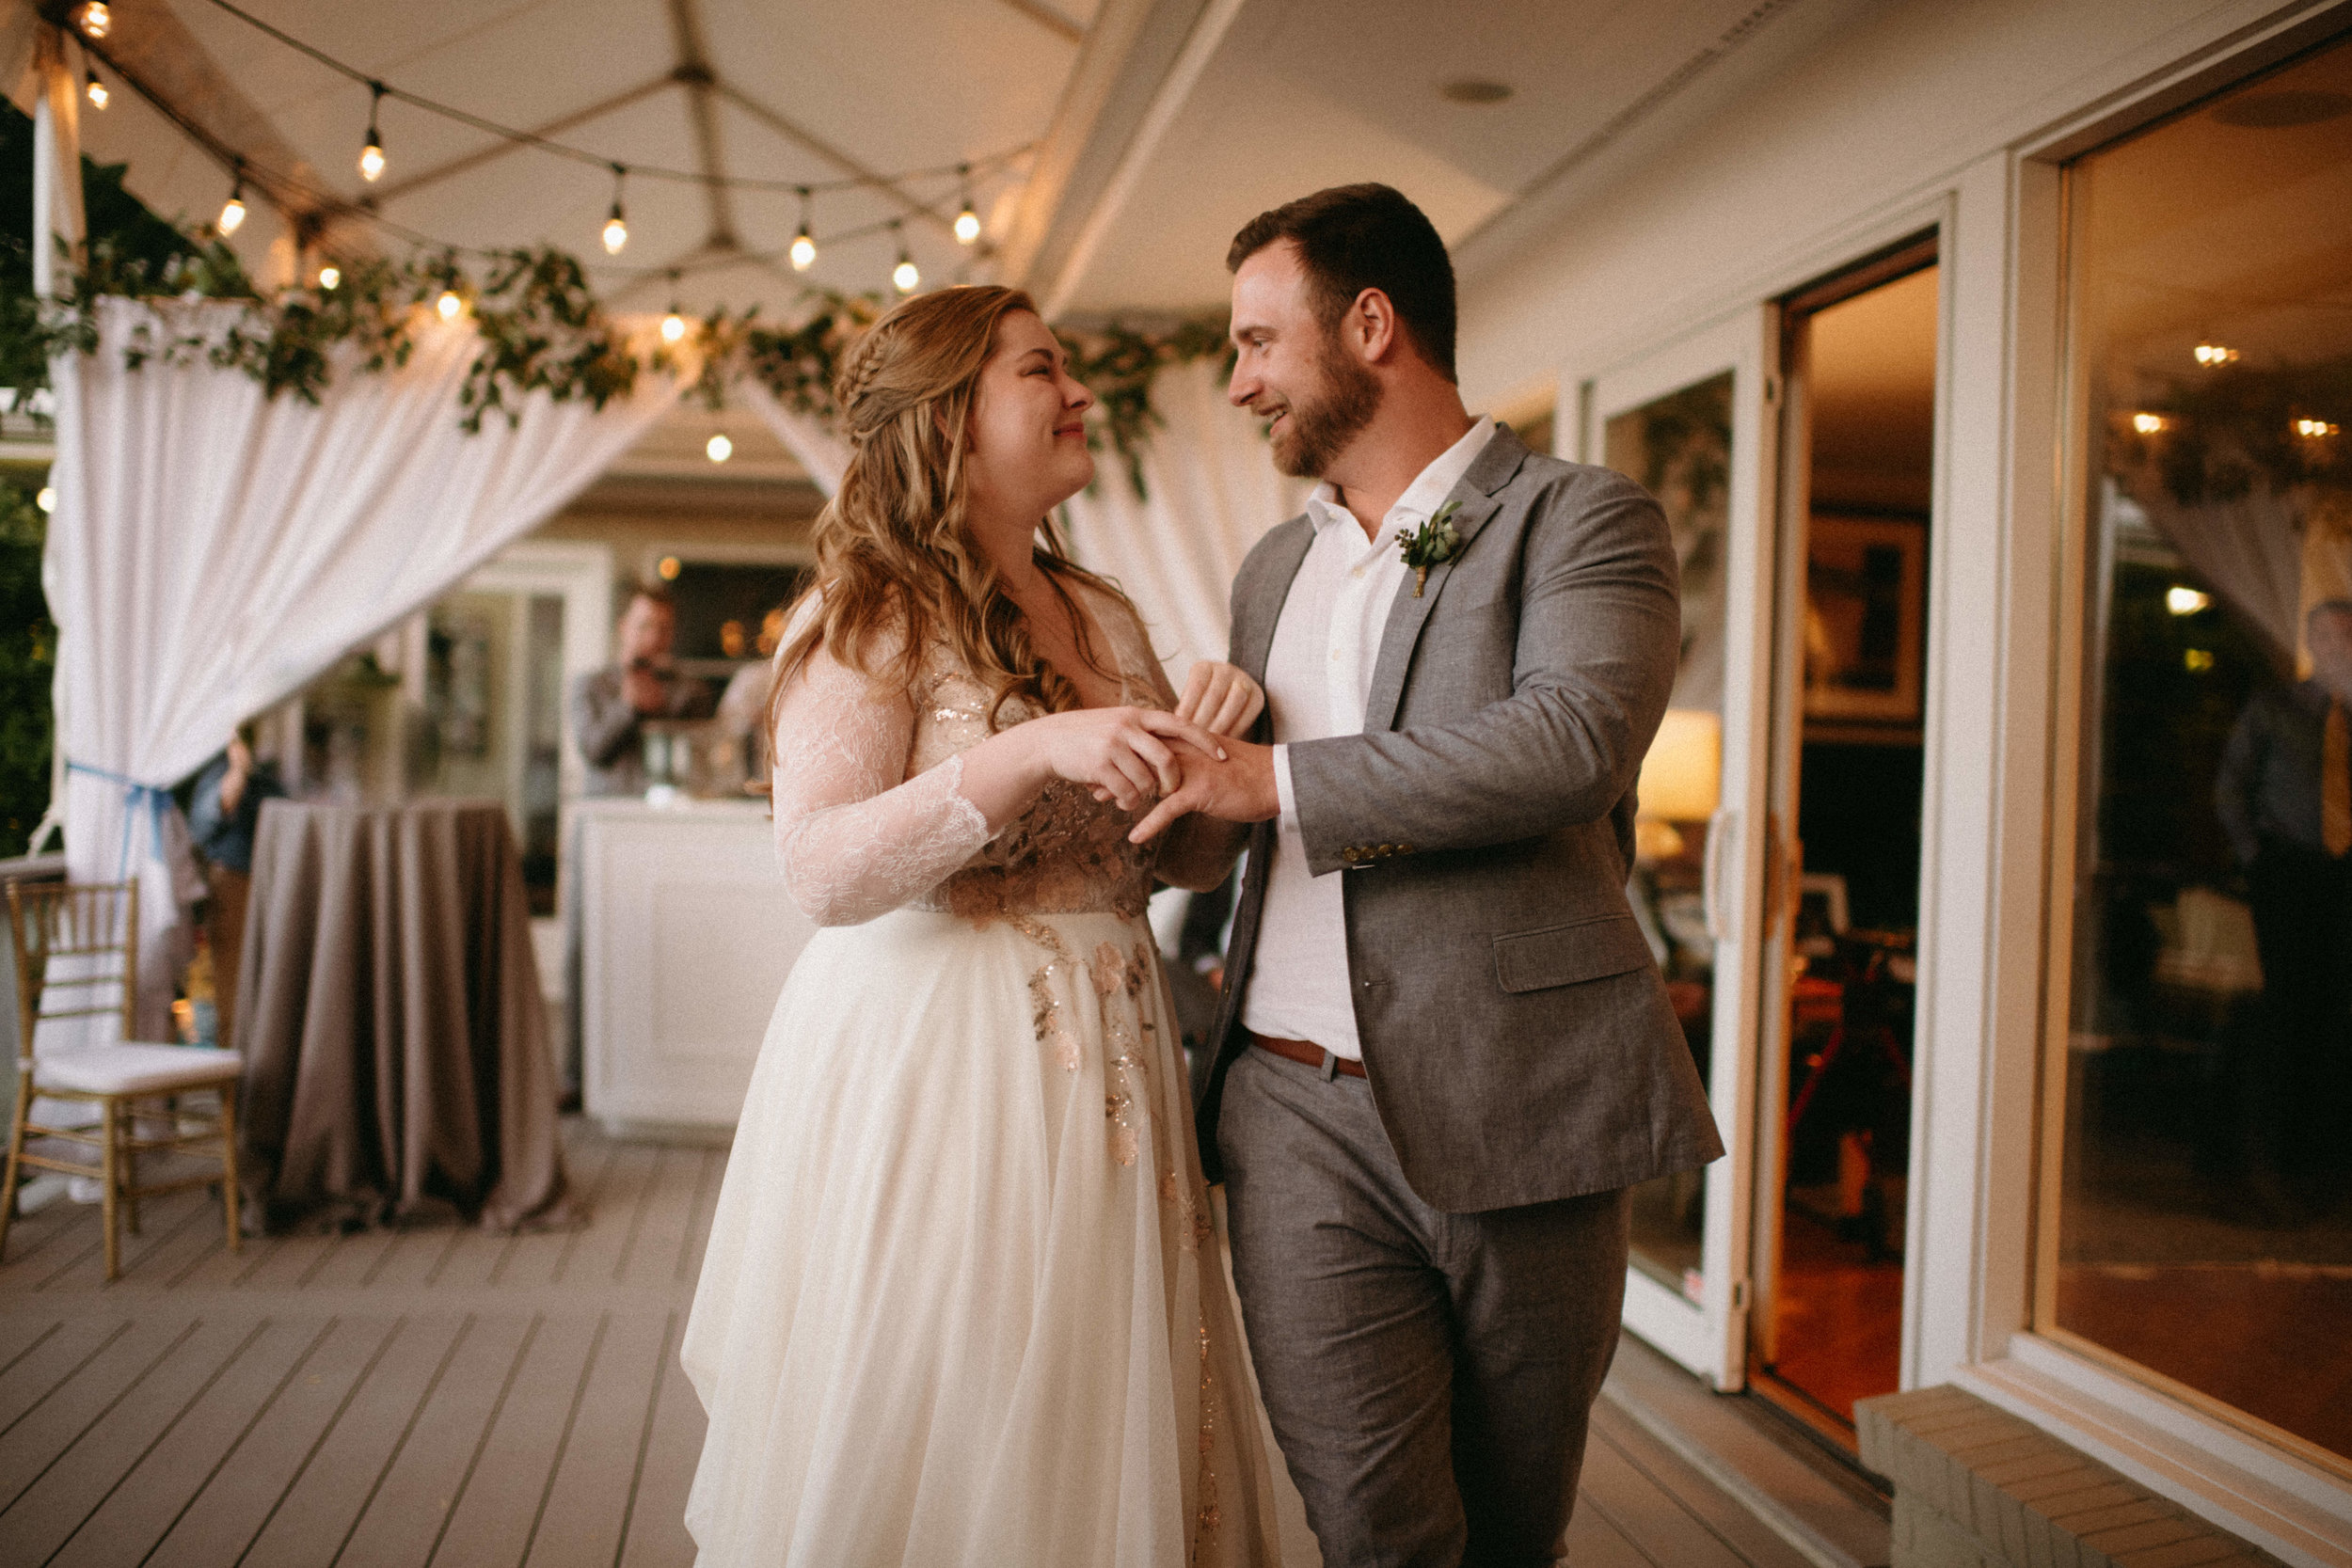 Elizabeth and Aldens Intimate Backyard wedding in Nashville Tennessee Wedding Photographer00020.jpg